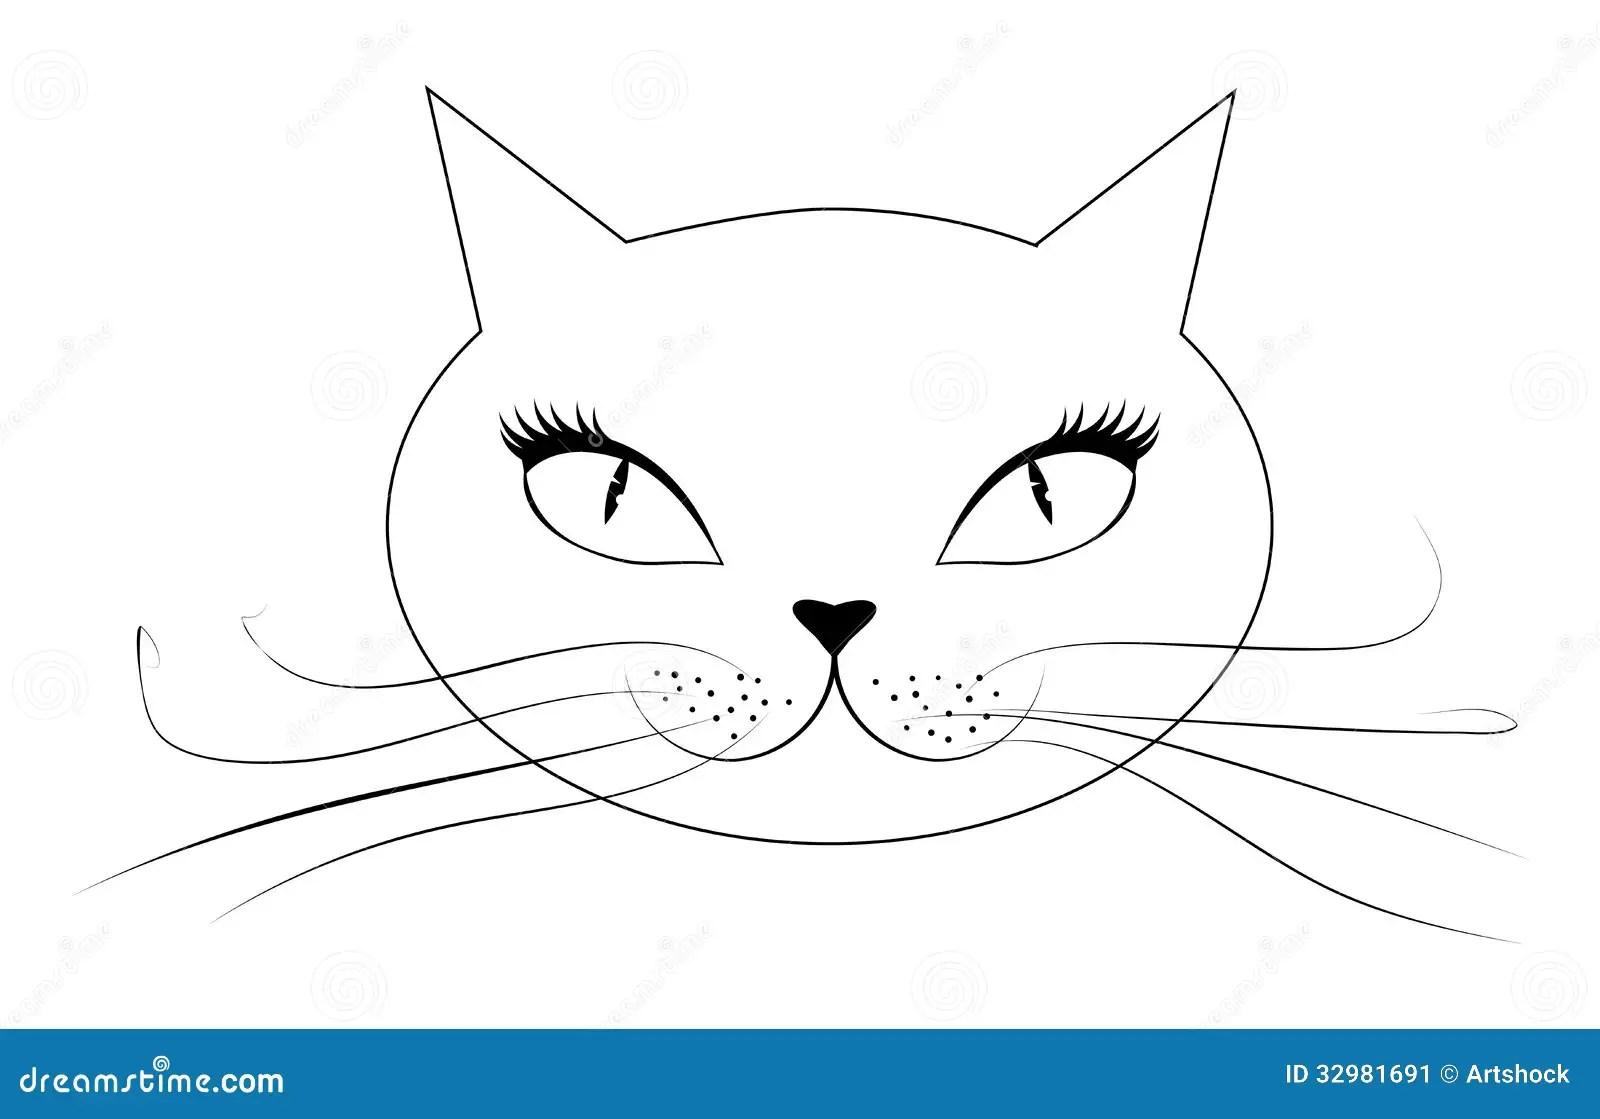 Mr No Face Cat